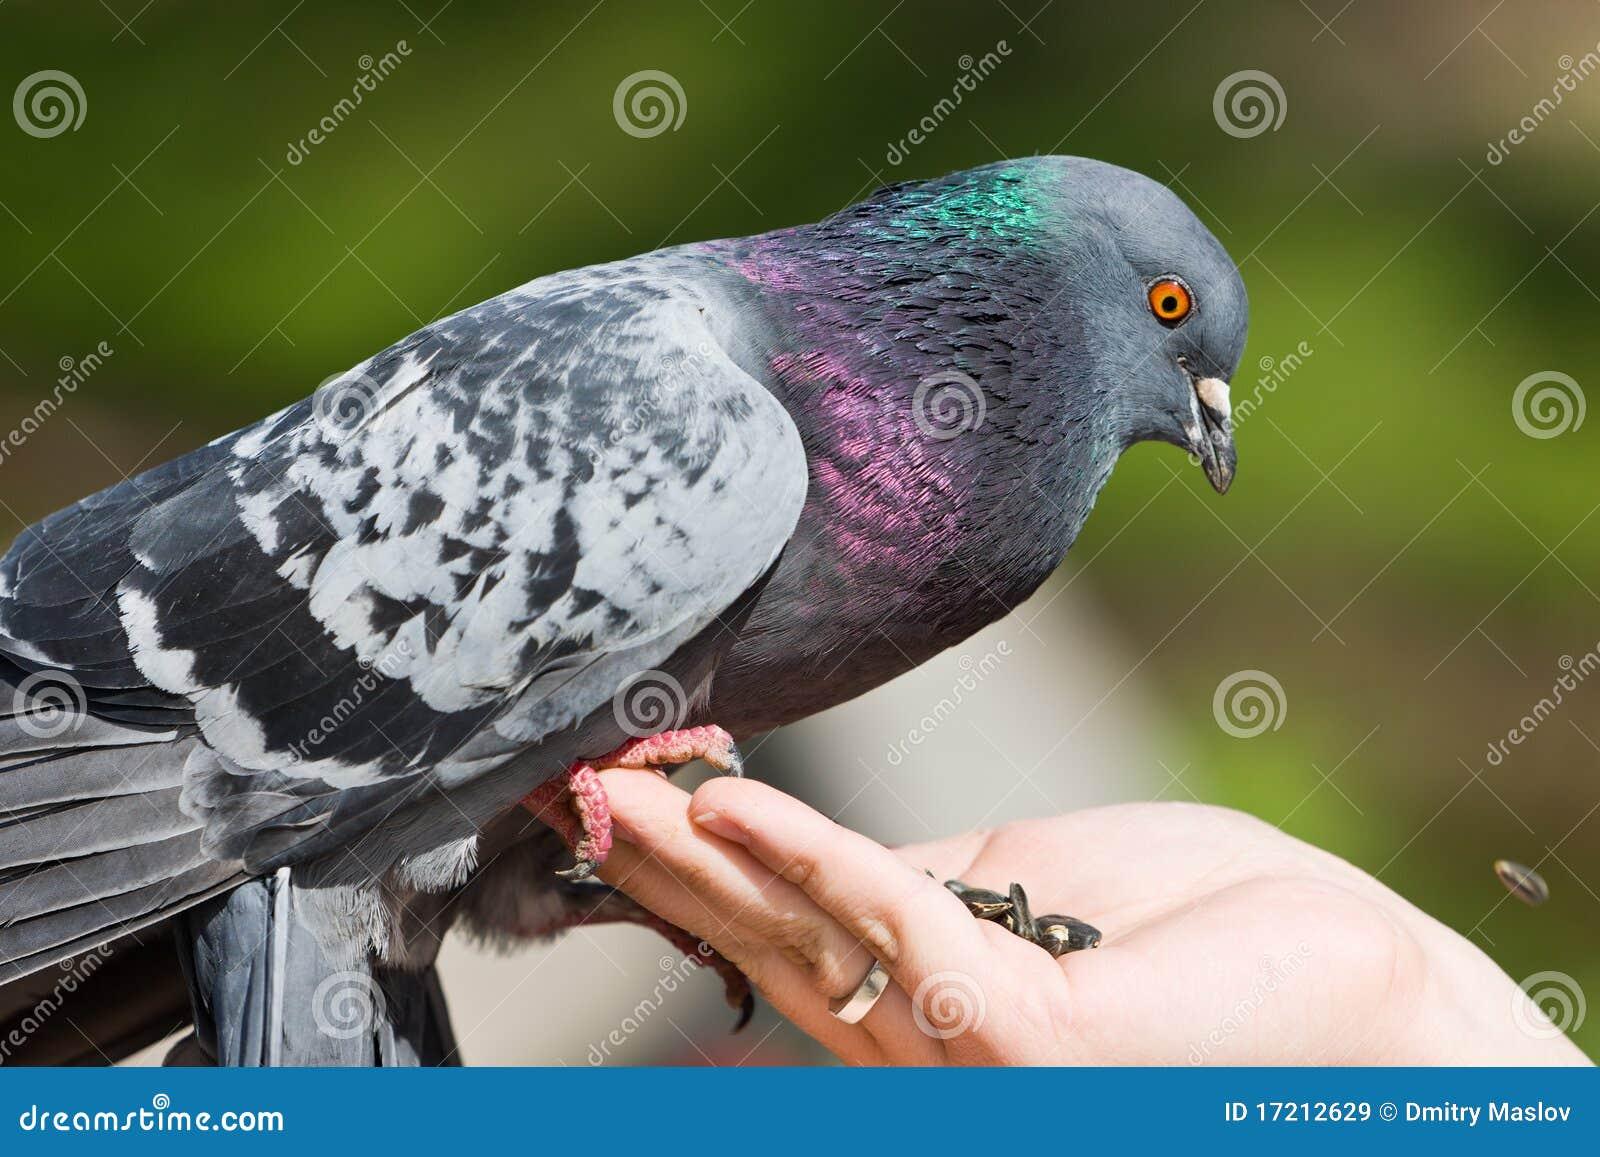 le pigeon mange des graines de tournesol image stock image du colombe oiseau 17212629. Black Bedroom Furniture Sets. Home Design Ideas